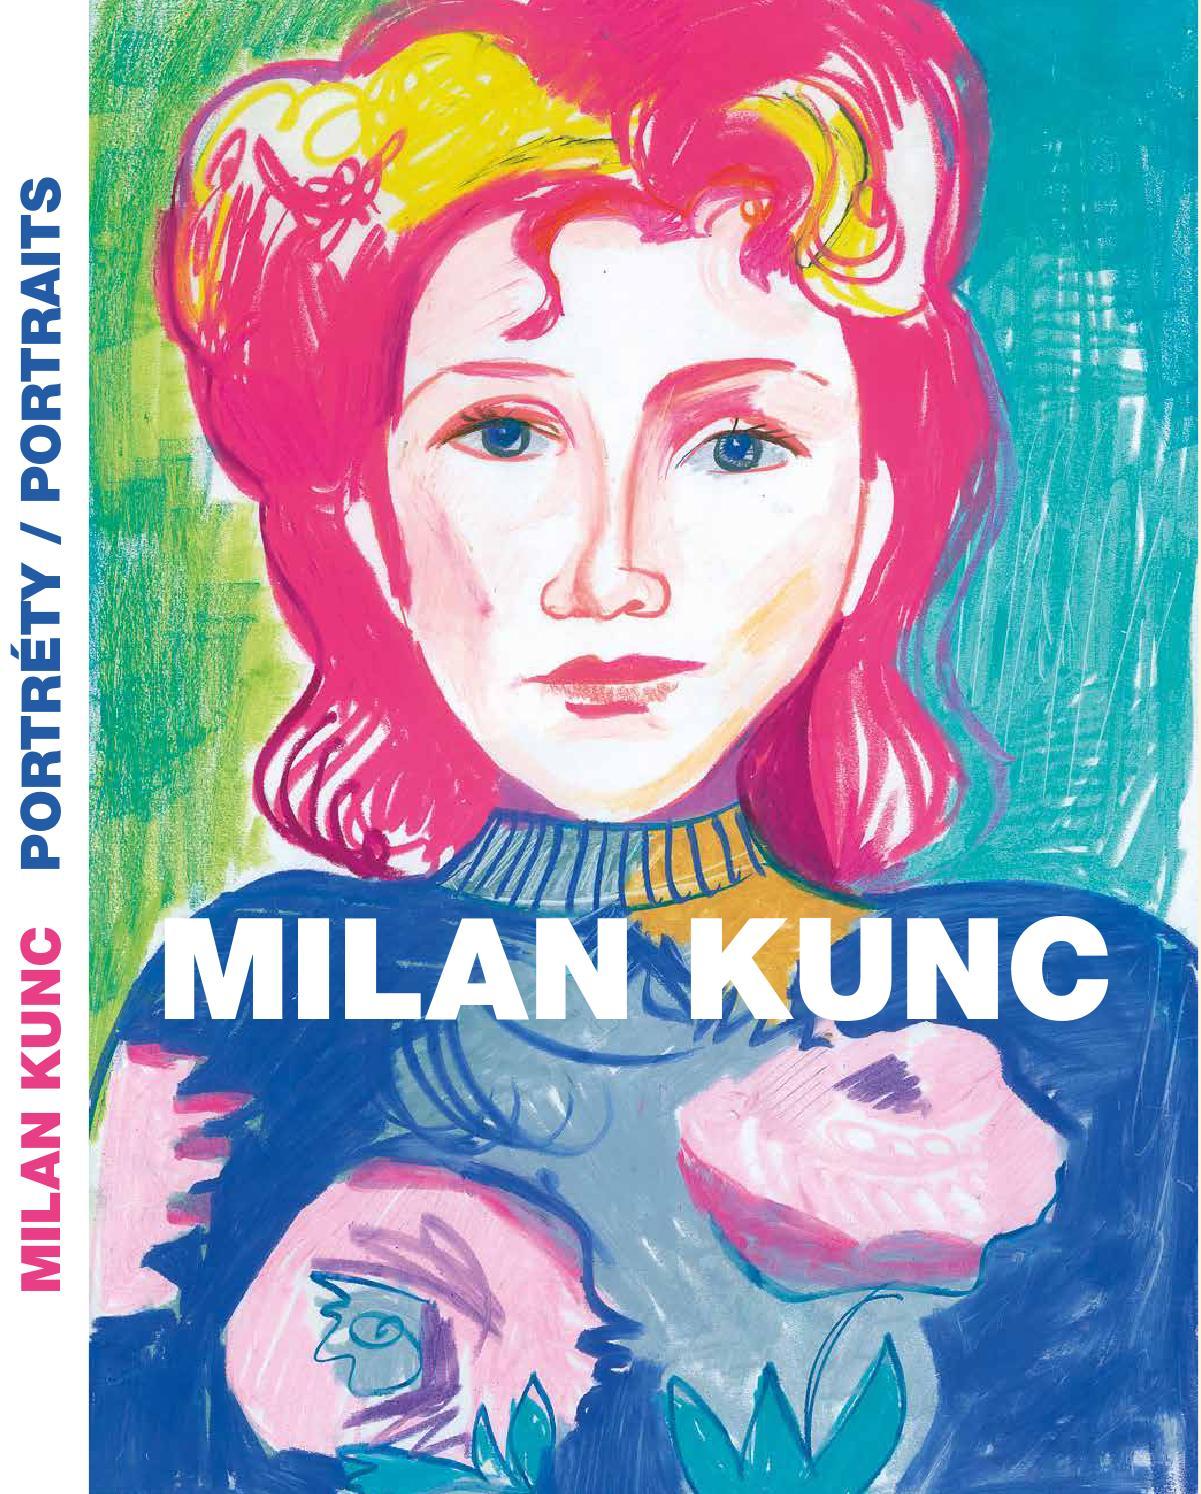 TUSCANY - SECRET COUNCIL by Milan Kunc on artnet